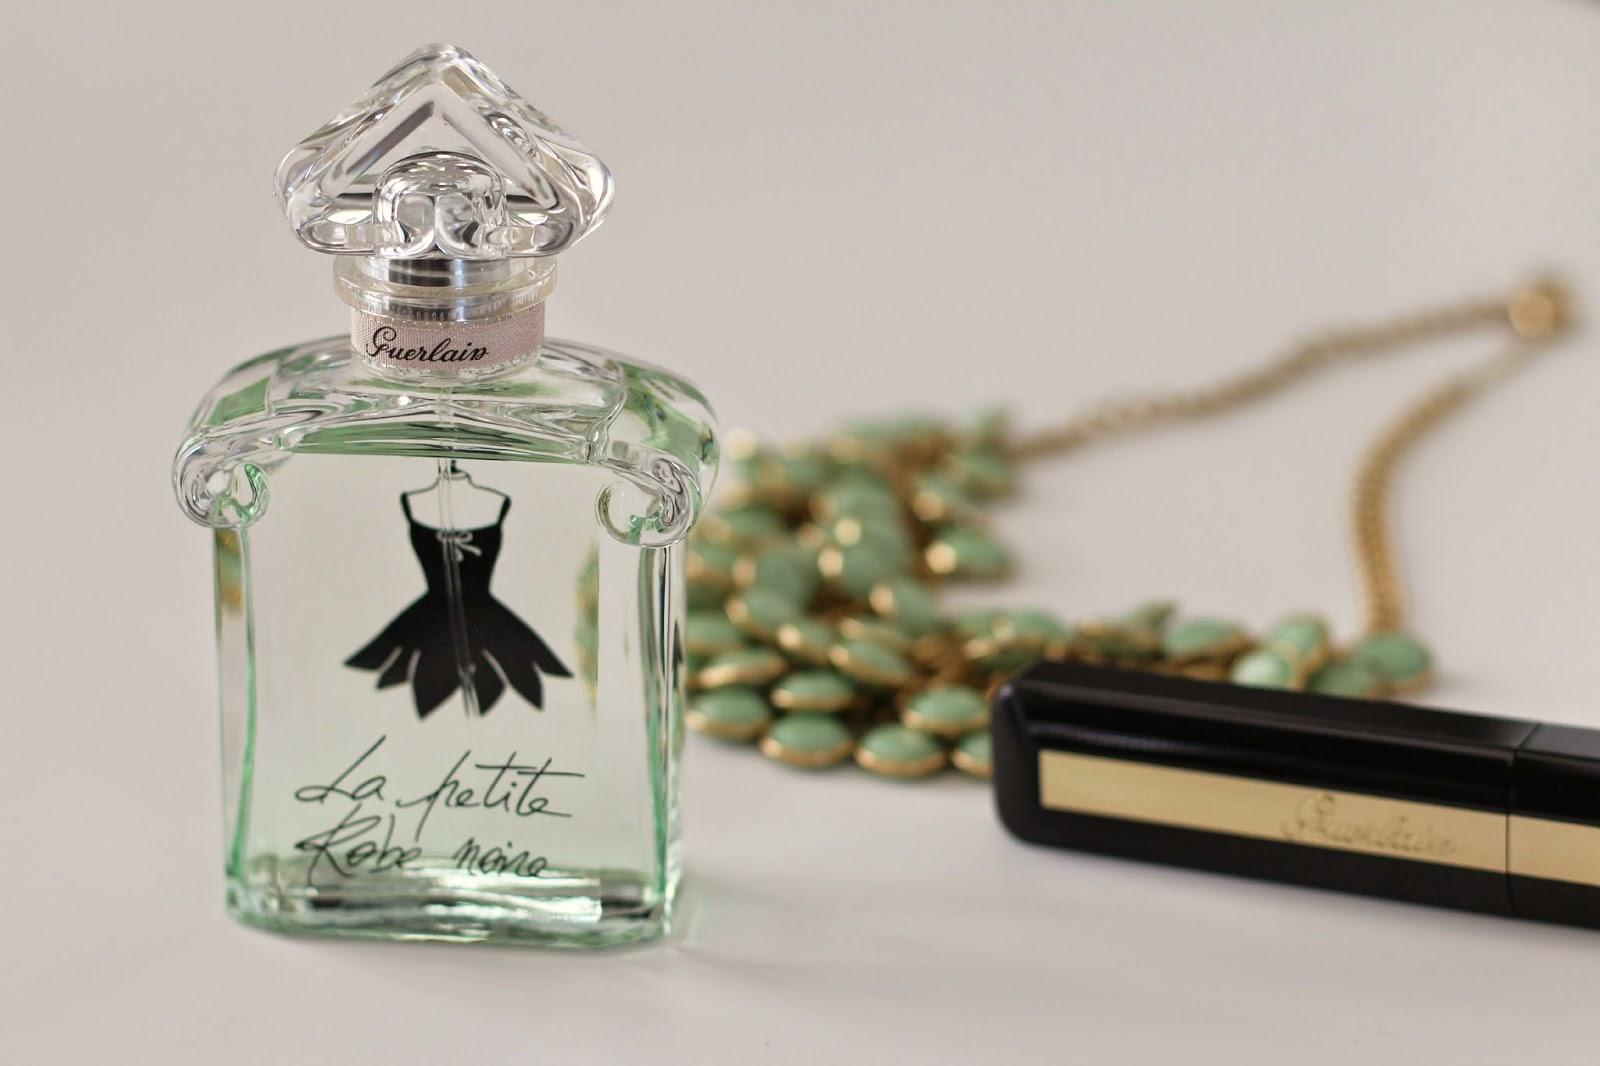 Guerlain petite robe noir prix